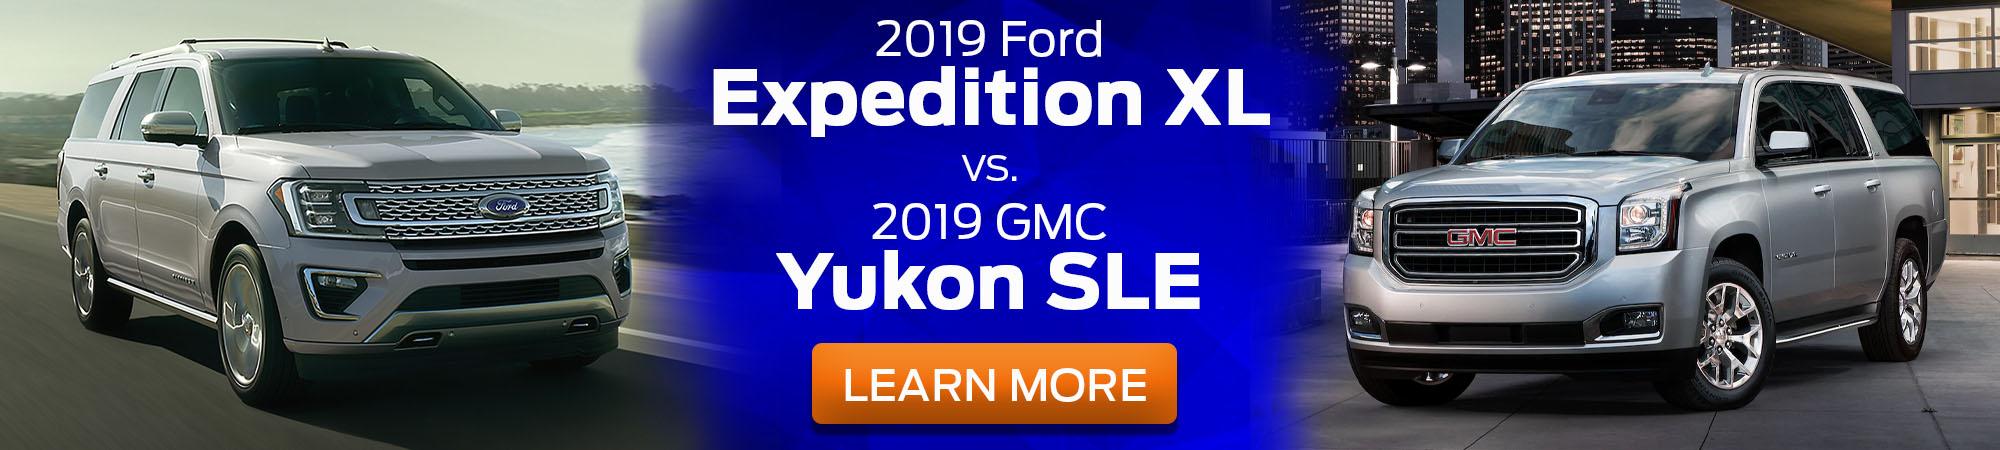 2019 Ford Expedition XL v 2019 GMC Yukon SLE